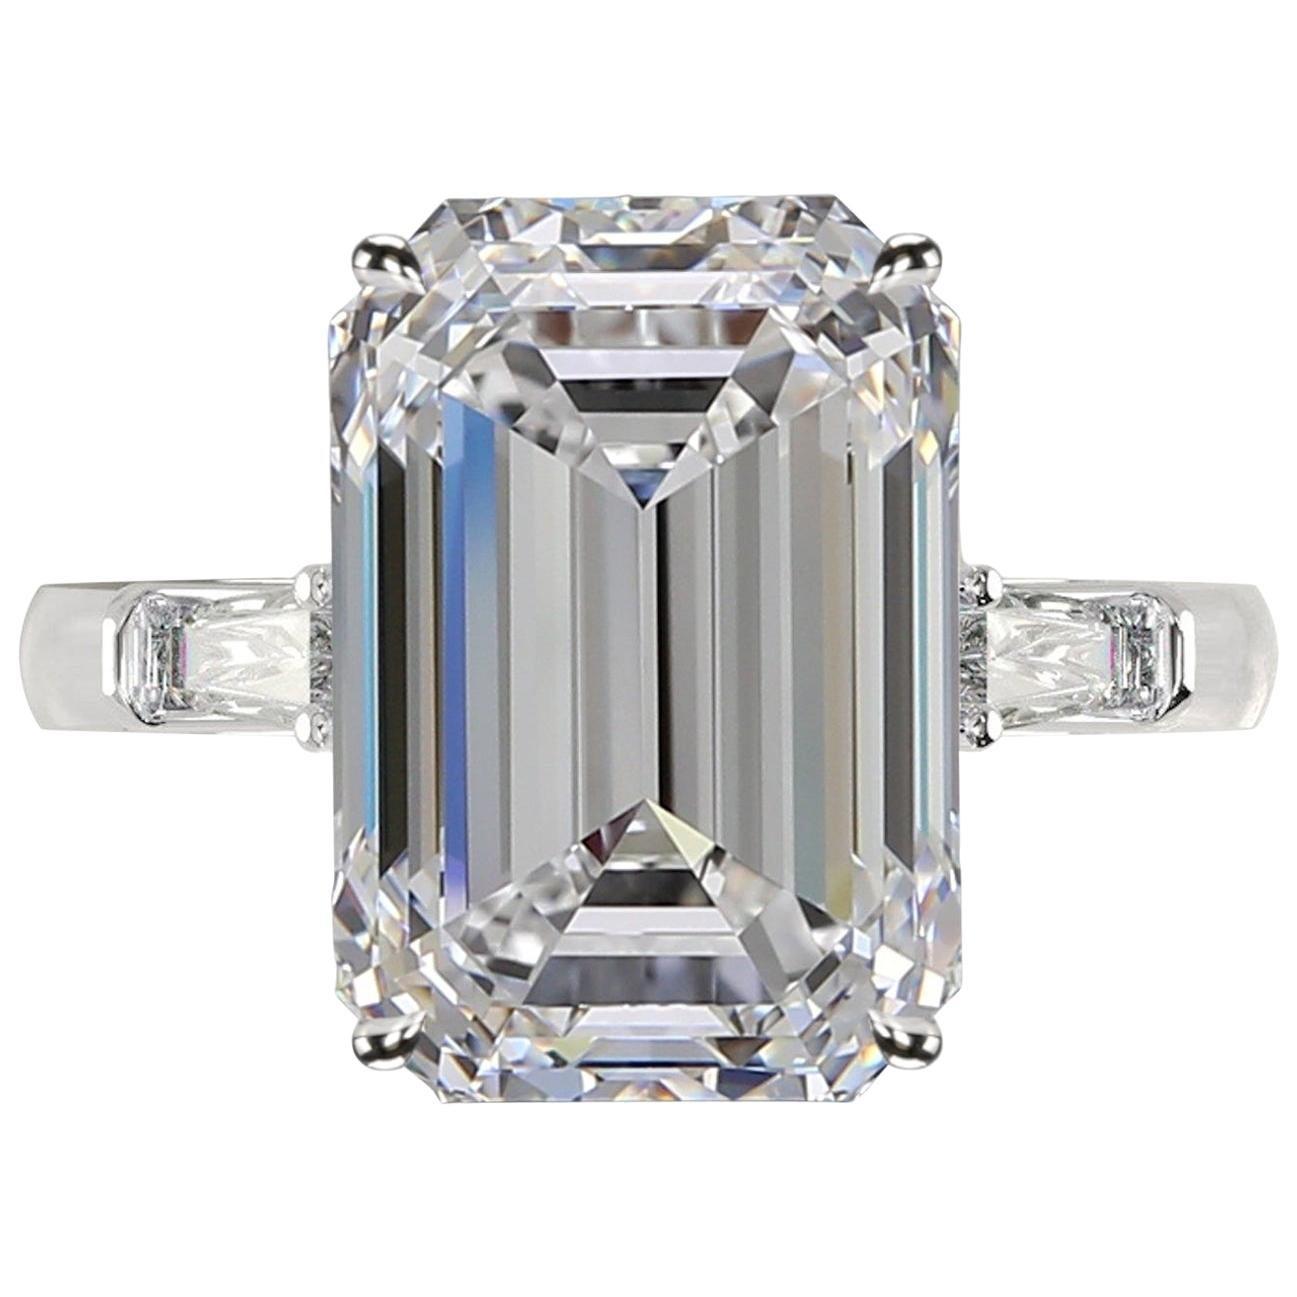 GIA Certified 3.50 Carat Emerald Cut Diamond Ring H VS1 Excellent Cut